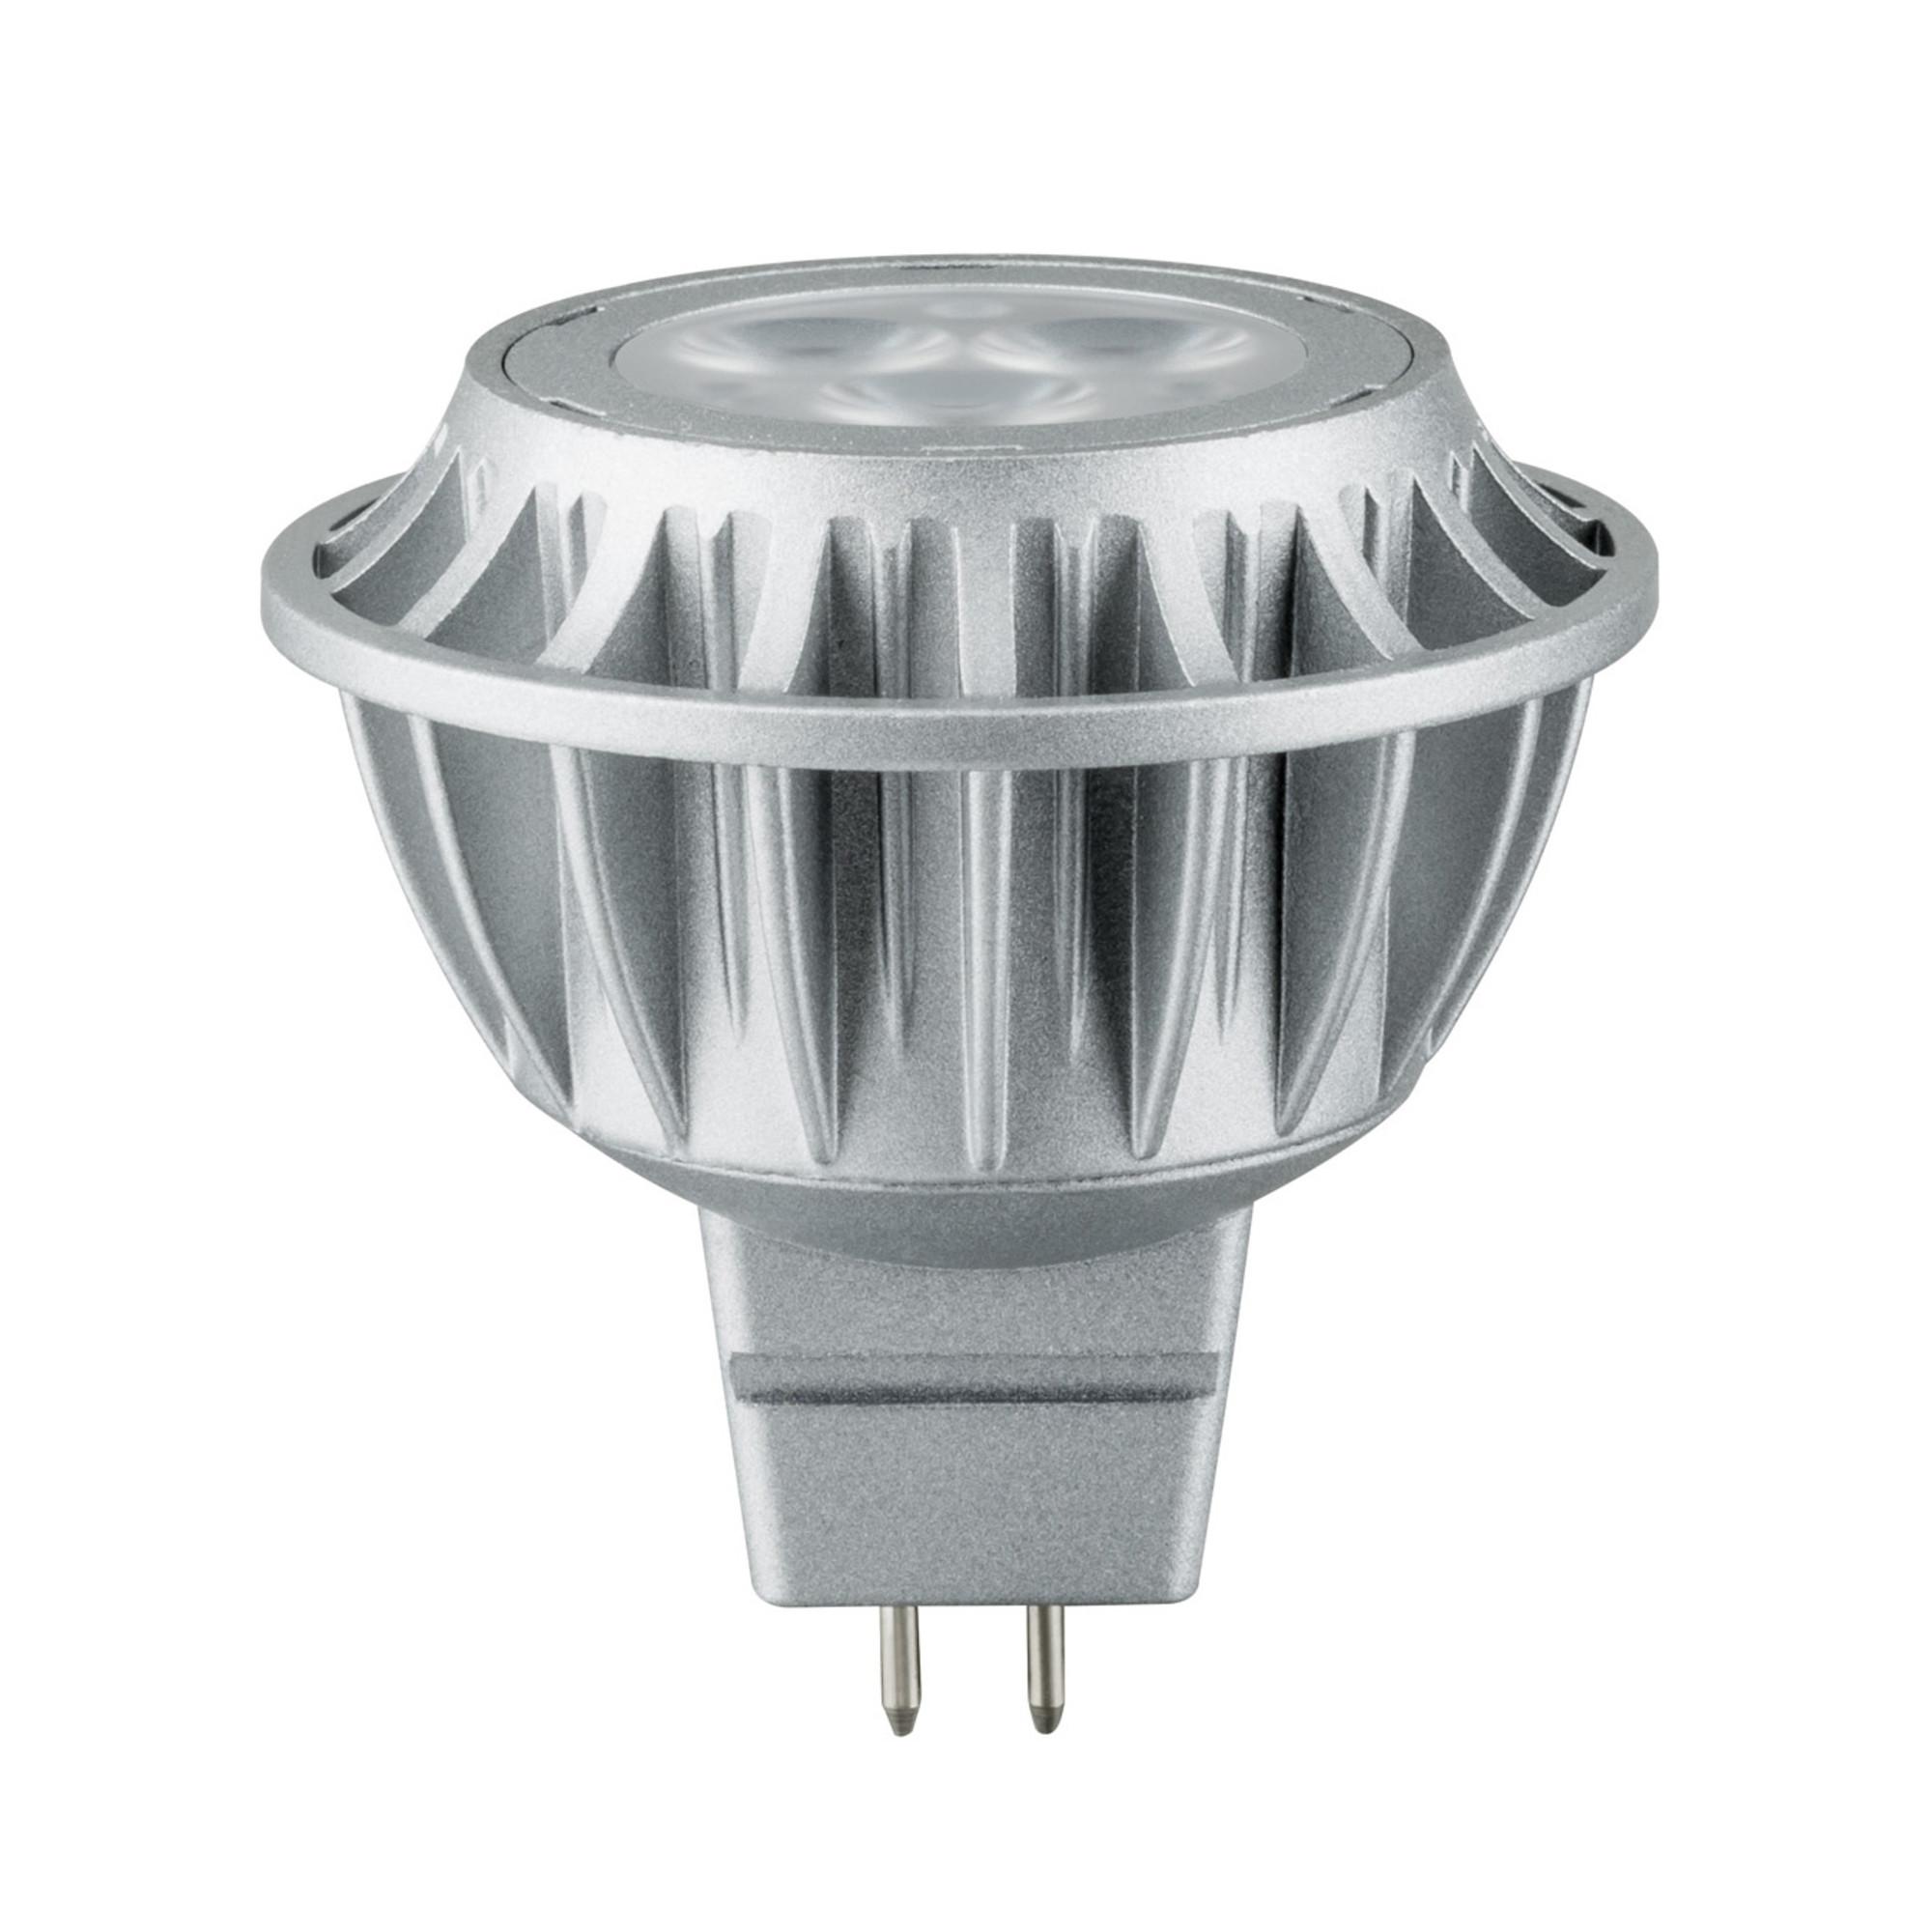 Лампа светодиодная Paulmann 28251 GU5.3 200 Лм зеленый свет